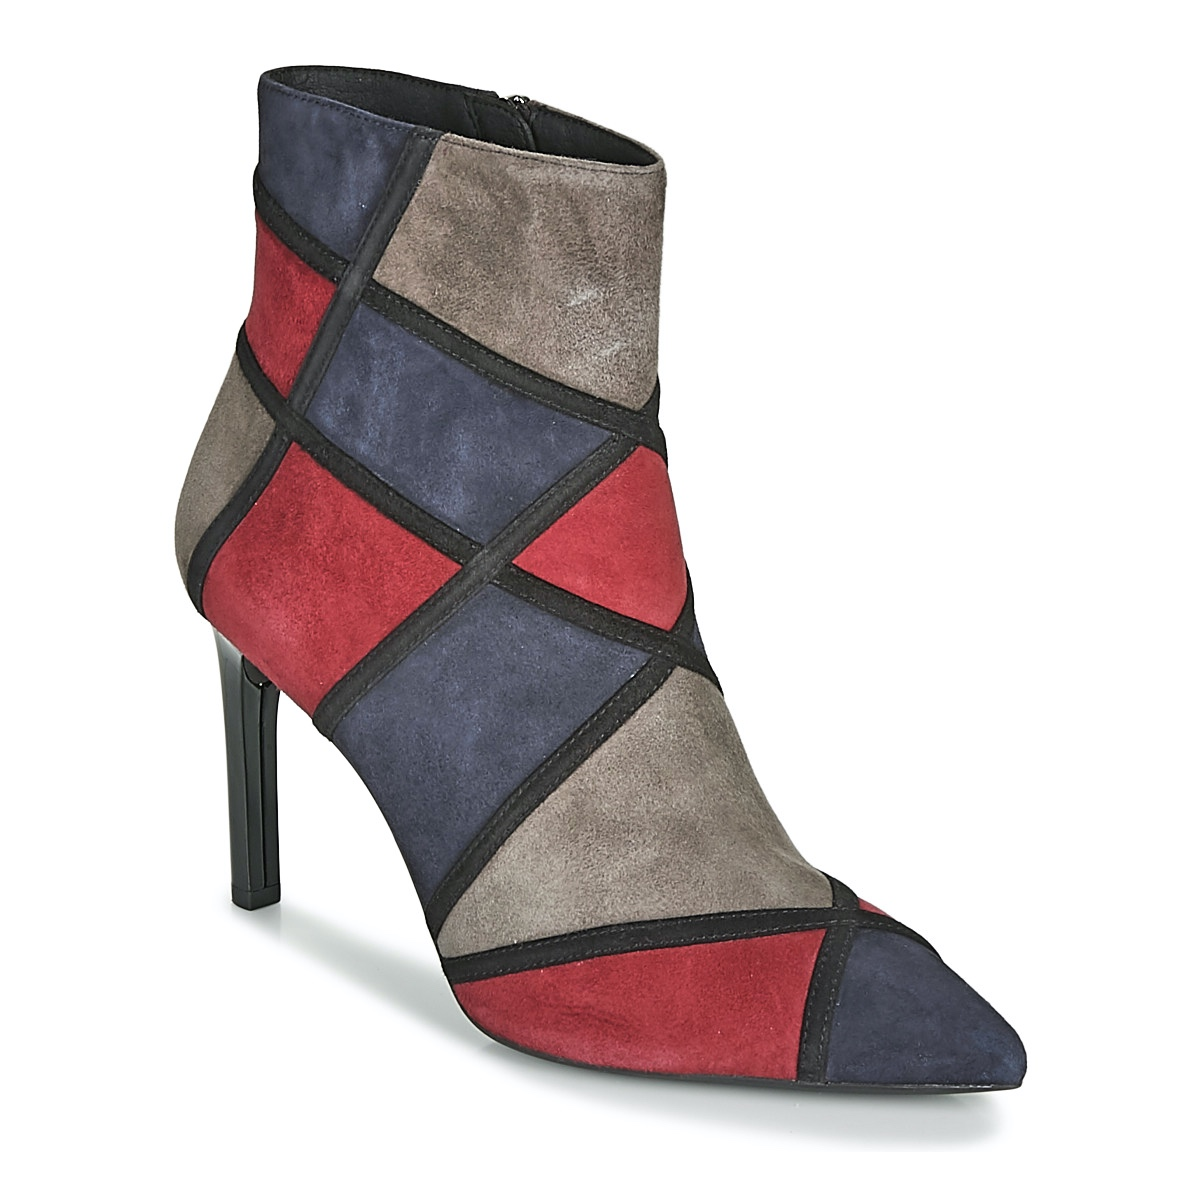 Pesimista Dar una vuelta No complicado  Geox Faviola B Ladies Ankle Boots D948UB Dark Navy Burgundy Multicoloured |  eBay